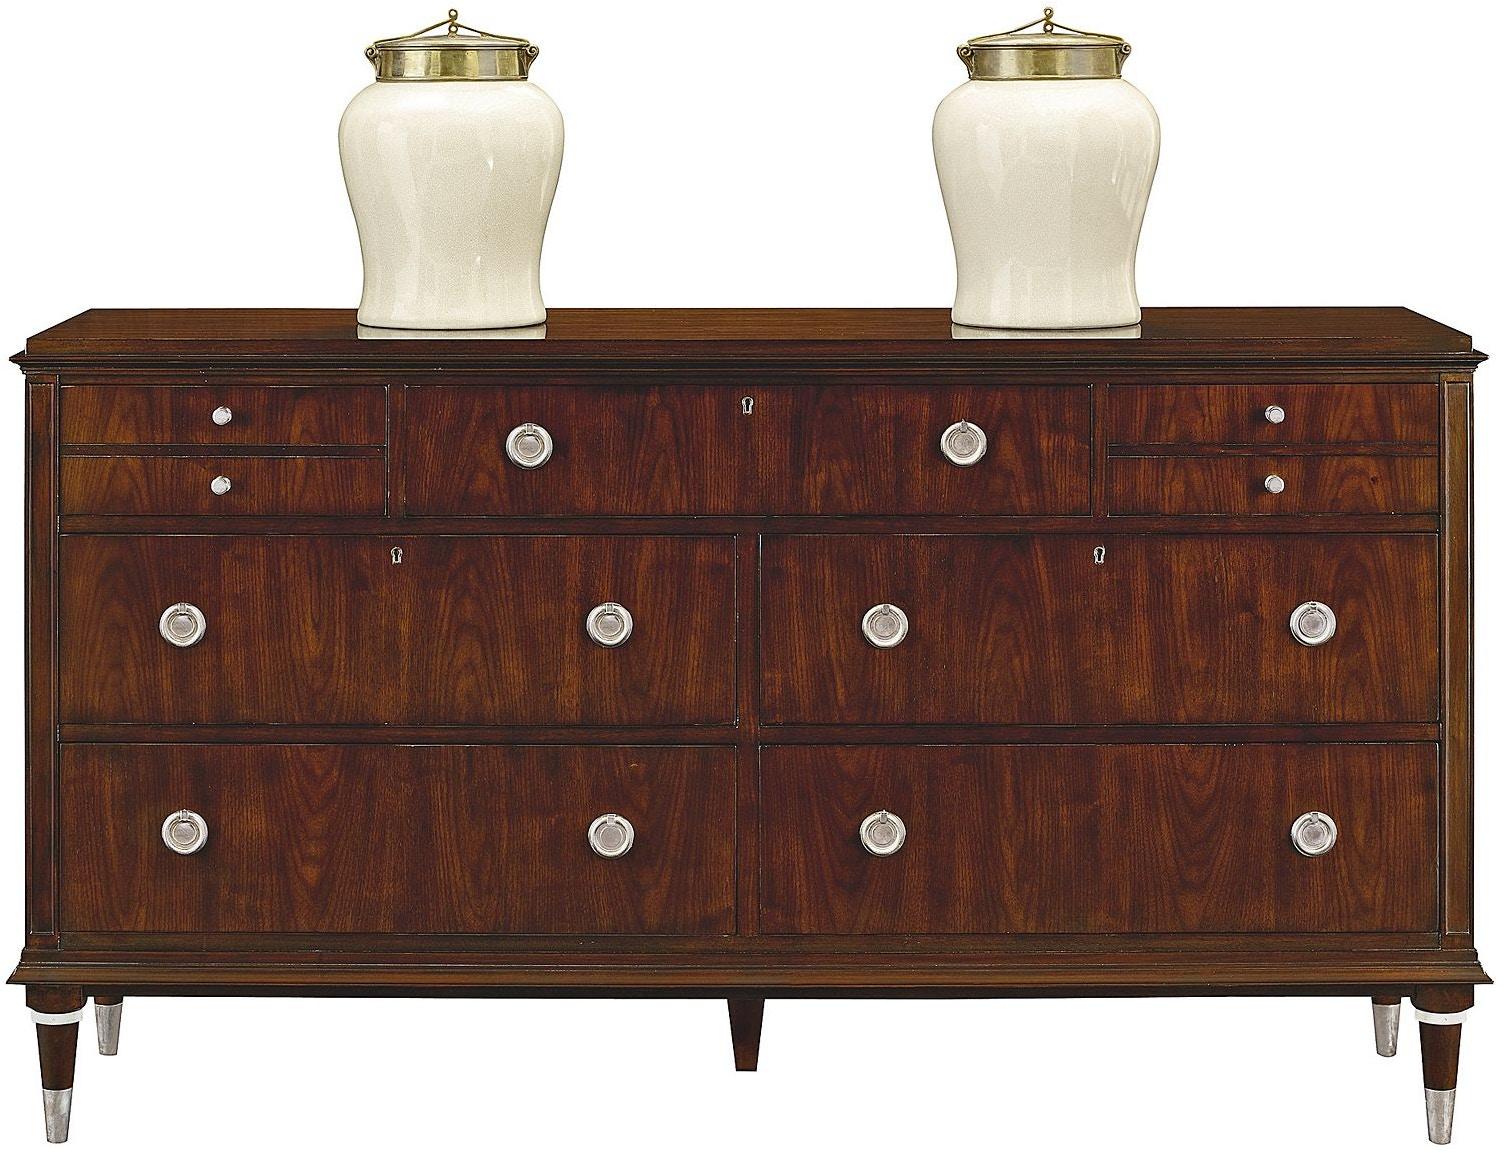 Henredon Furniture 7900-01 Bedroom Scene Six Double Dresser